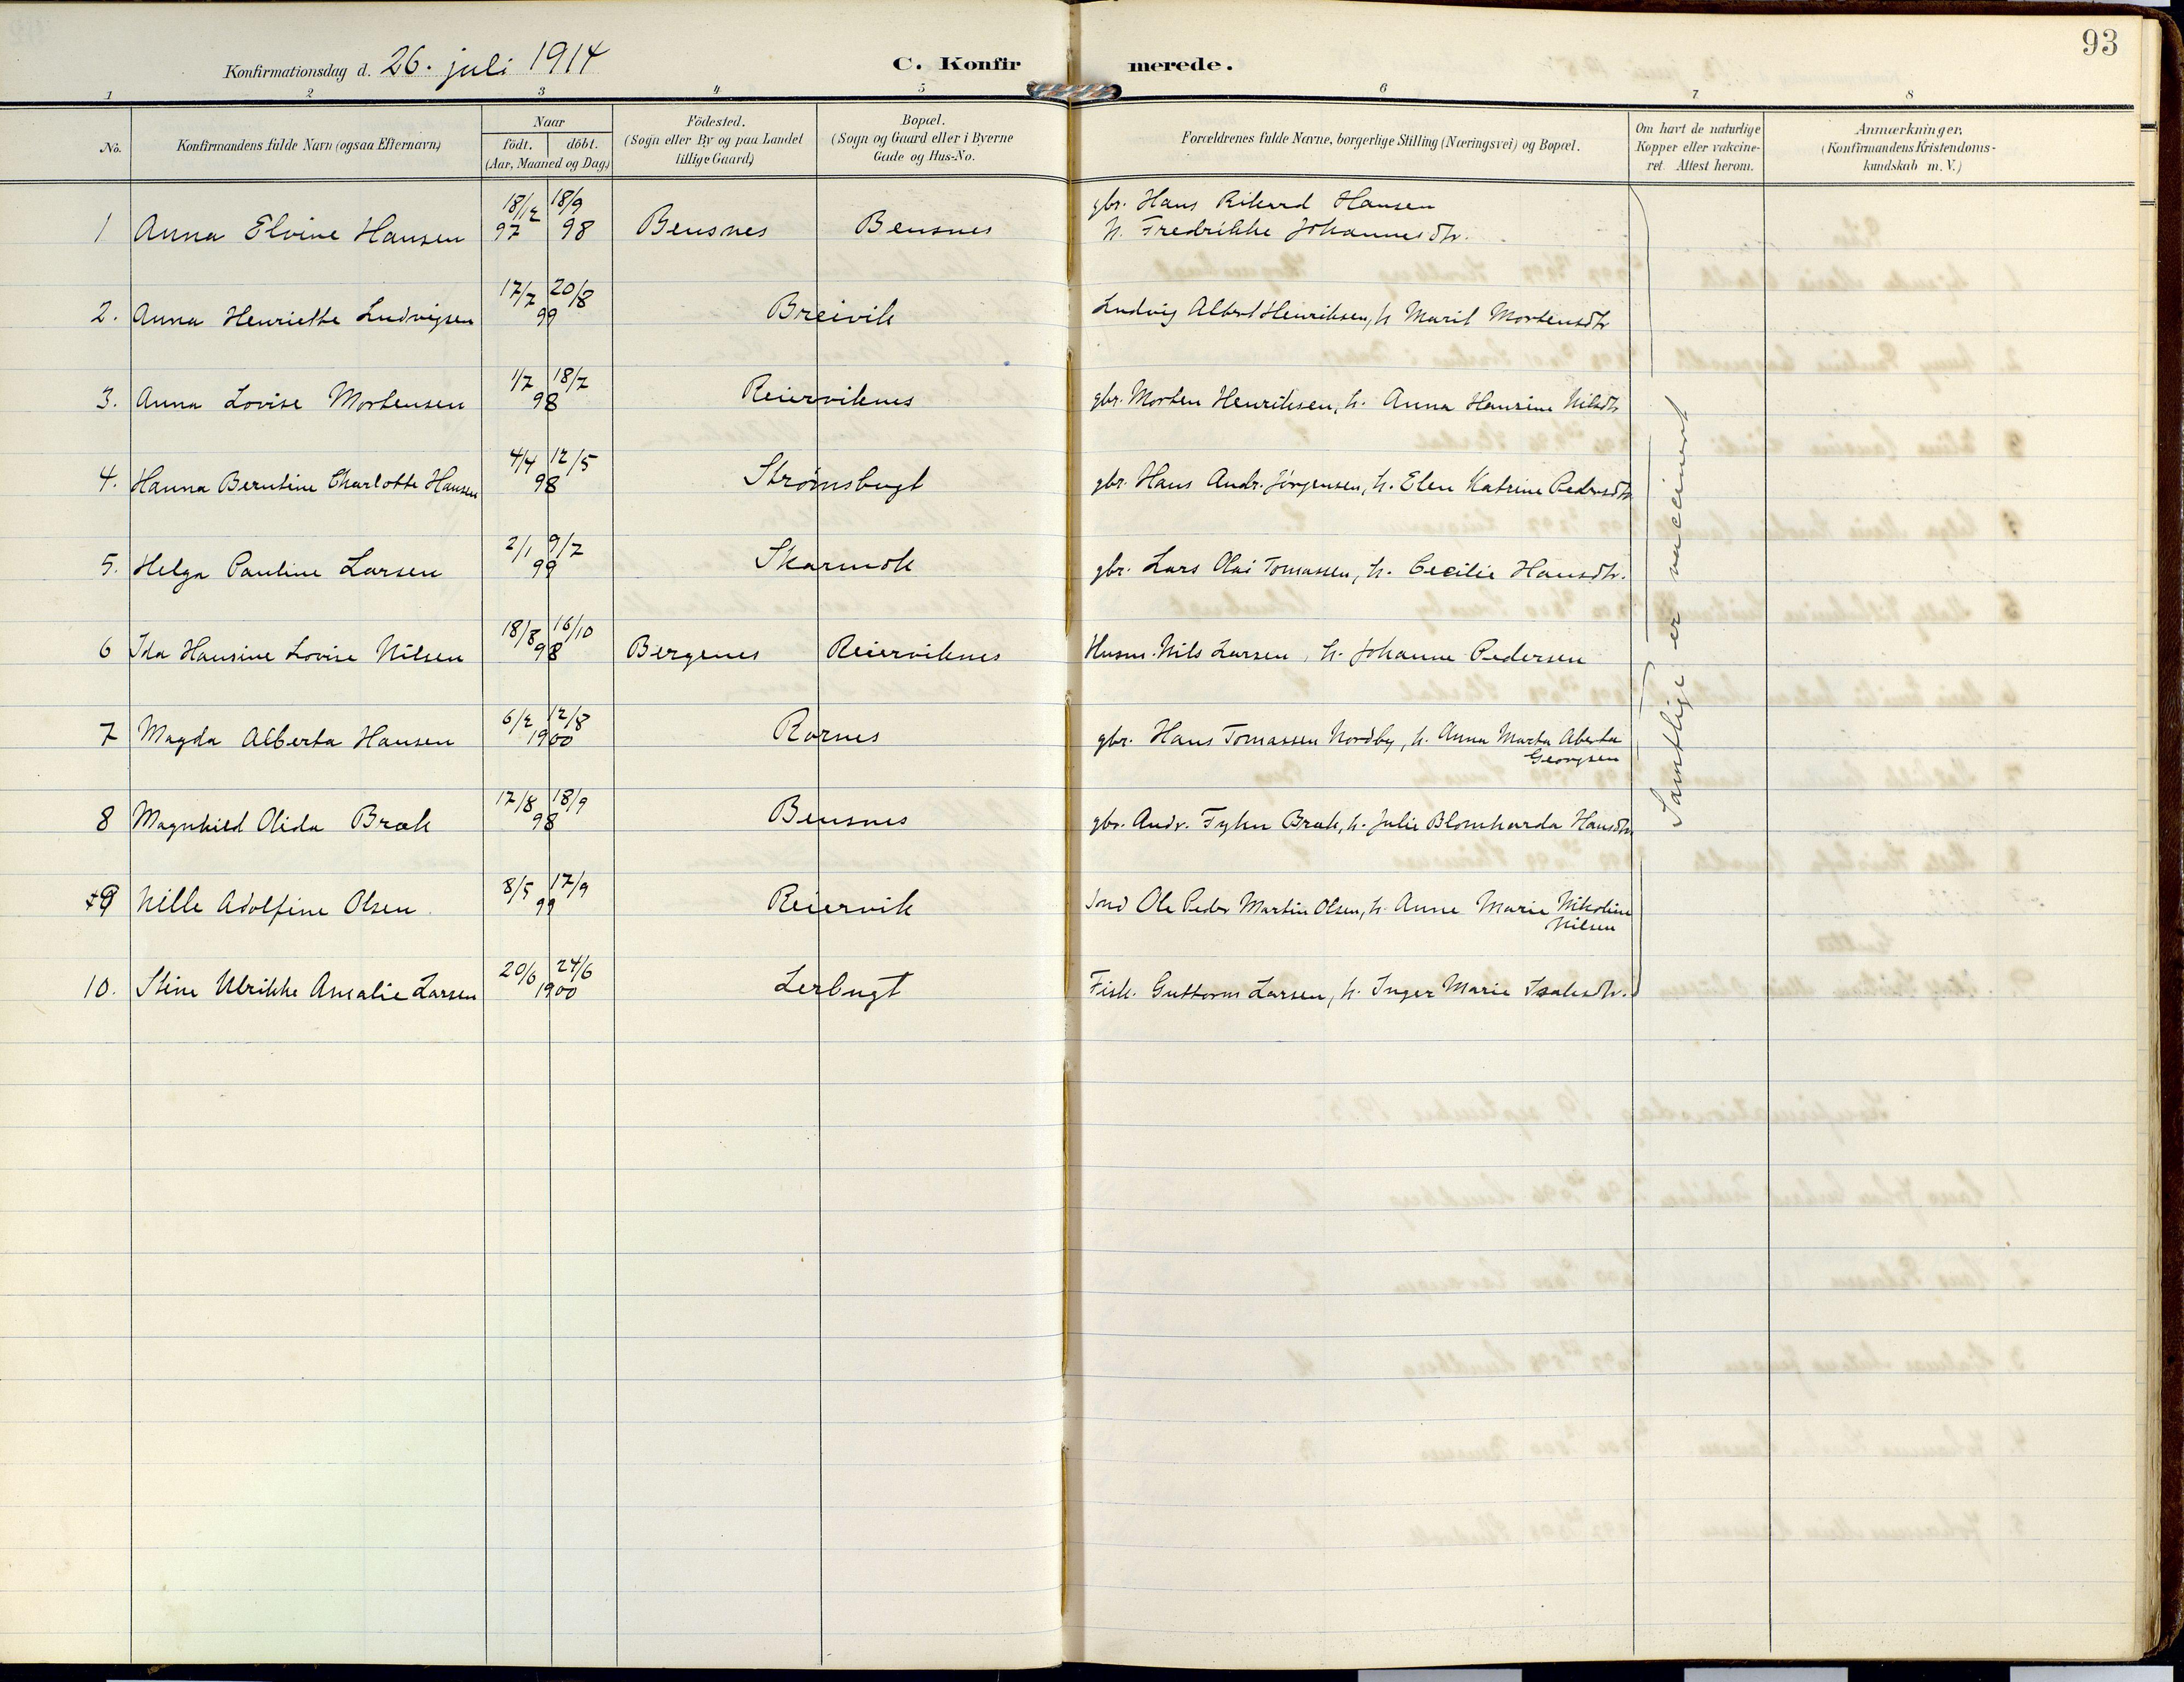 SATØ, Lyngen sokneprestembete, Ministerialbok nr. 14, 1905-1920, s. 93